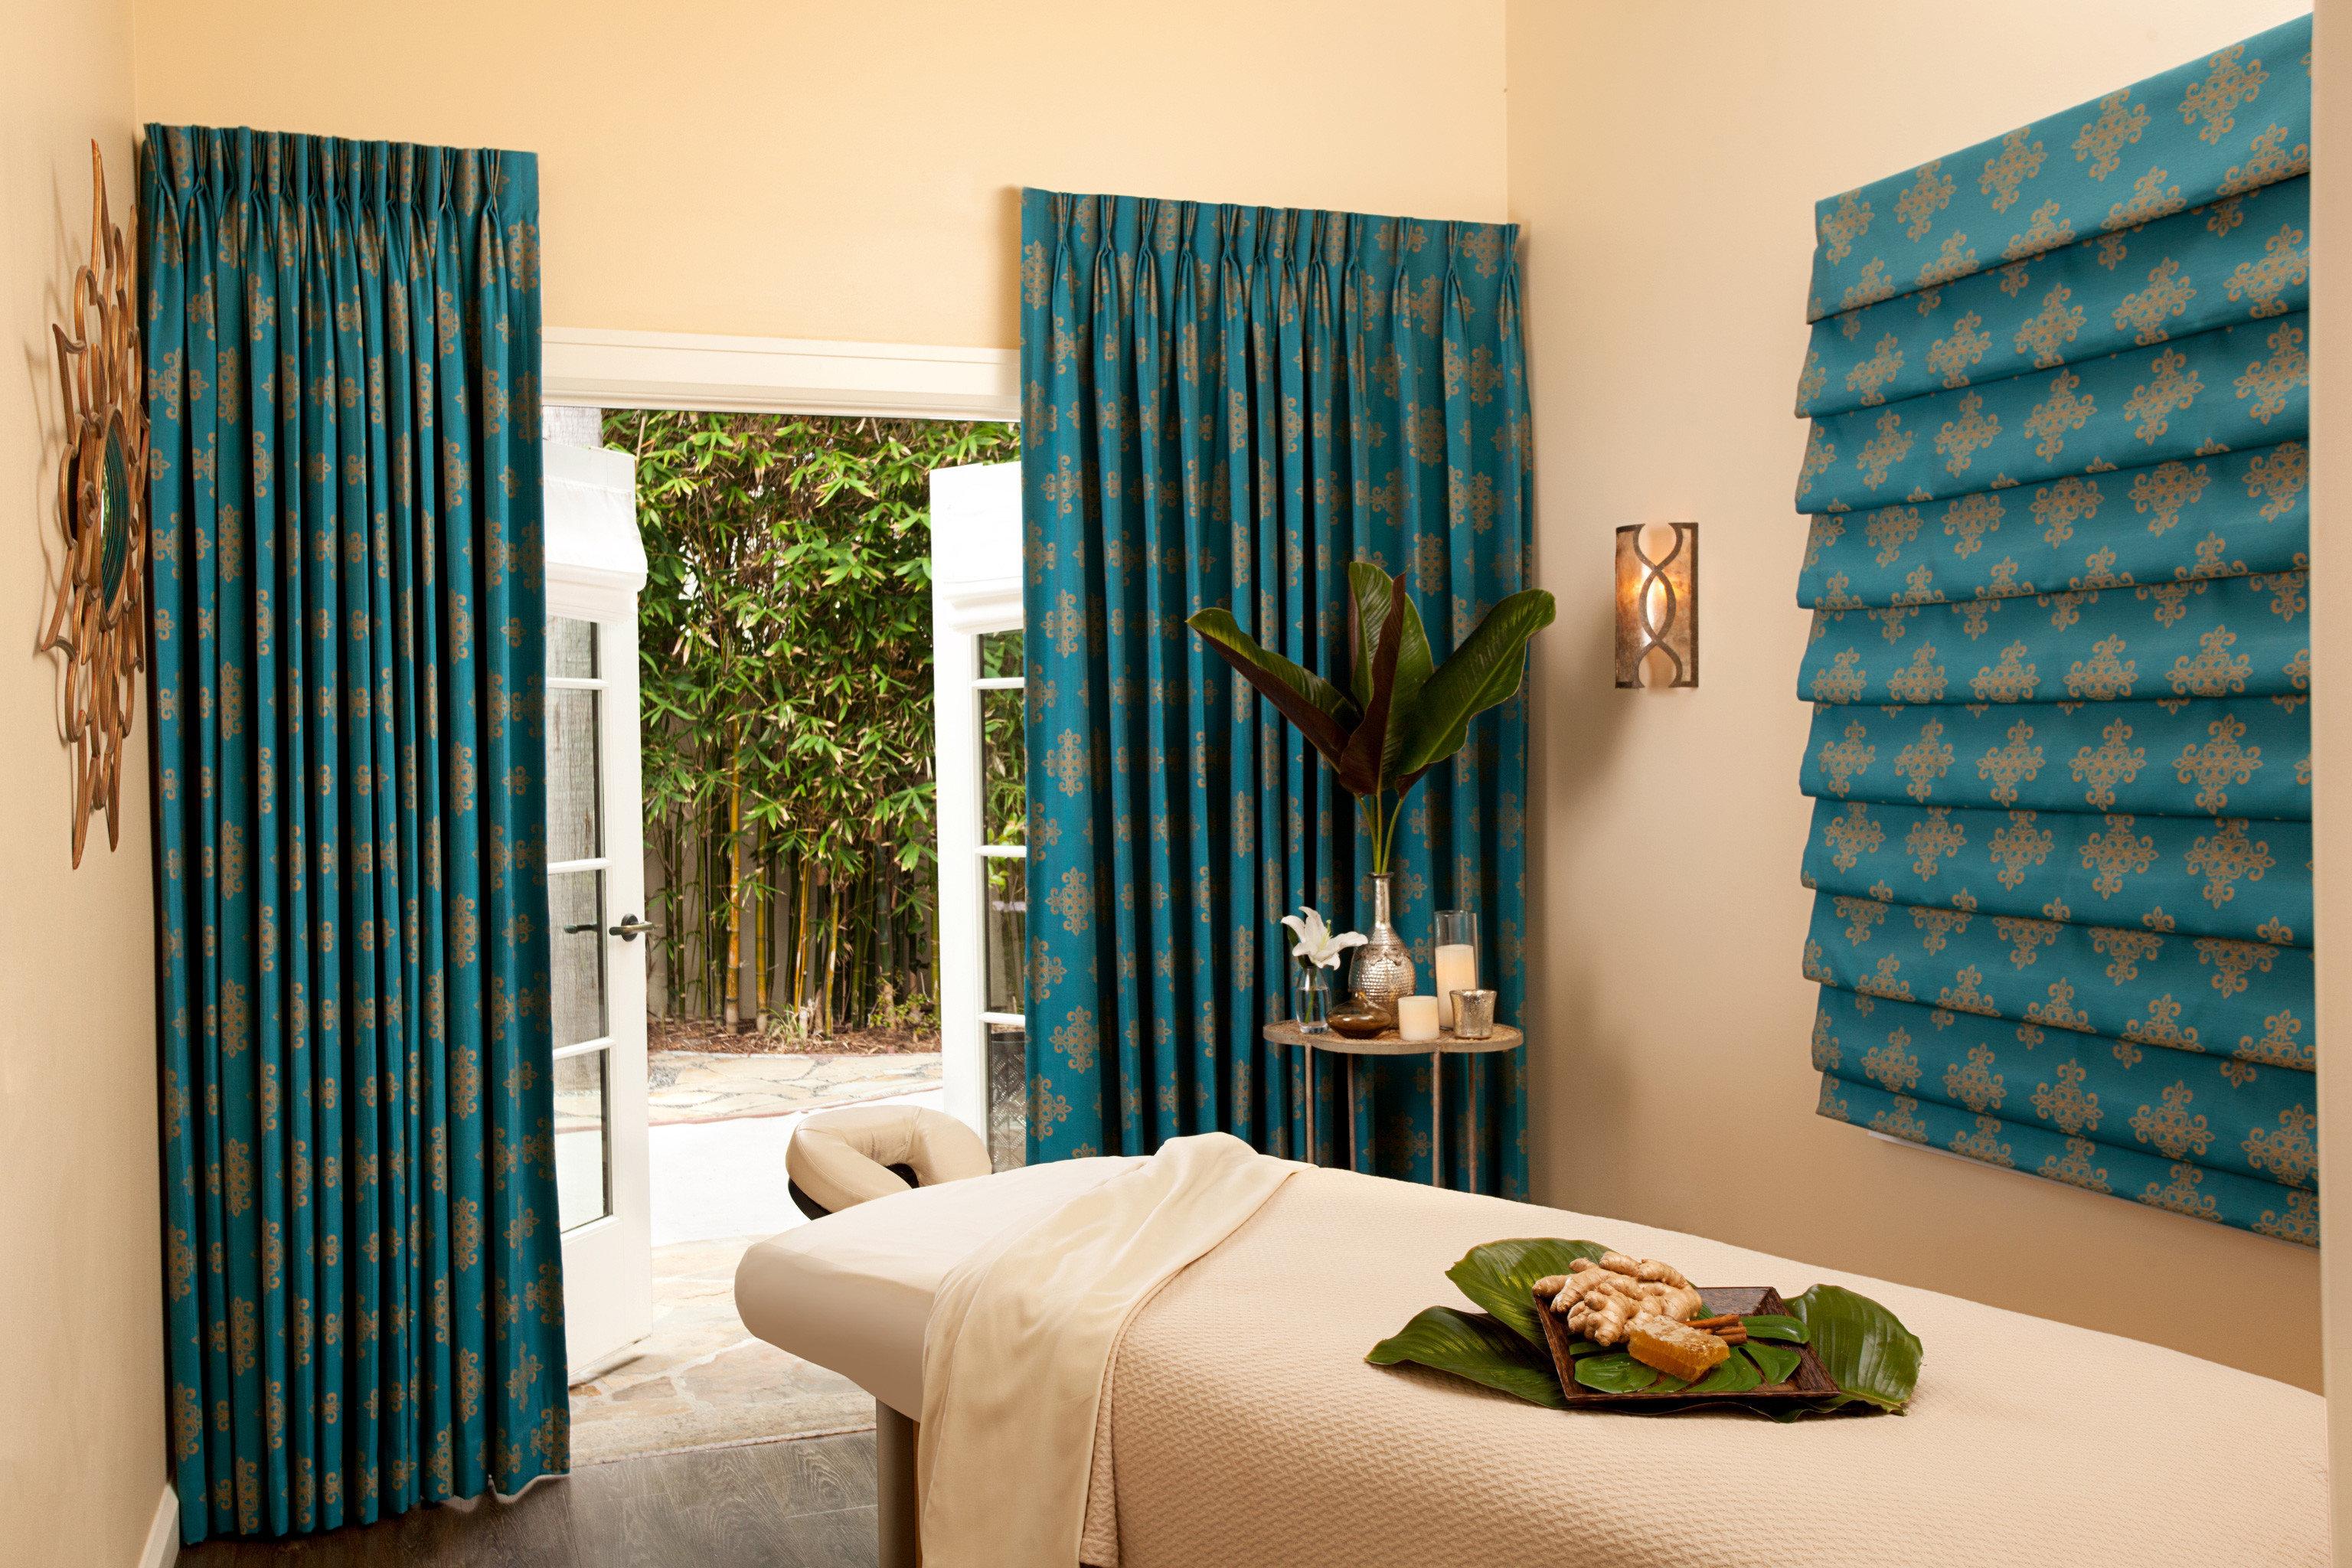 Resort Spa curtain blue green textile window treatment material Bedroom living room decor